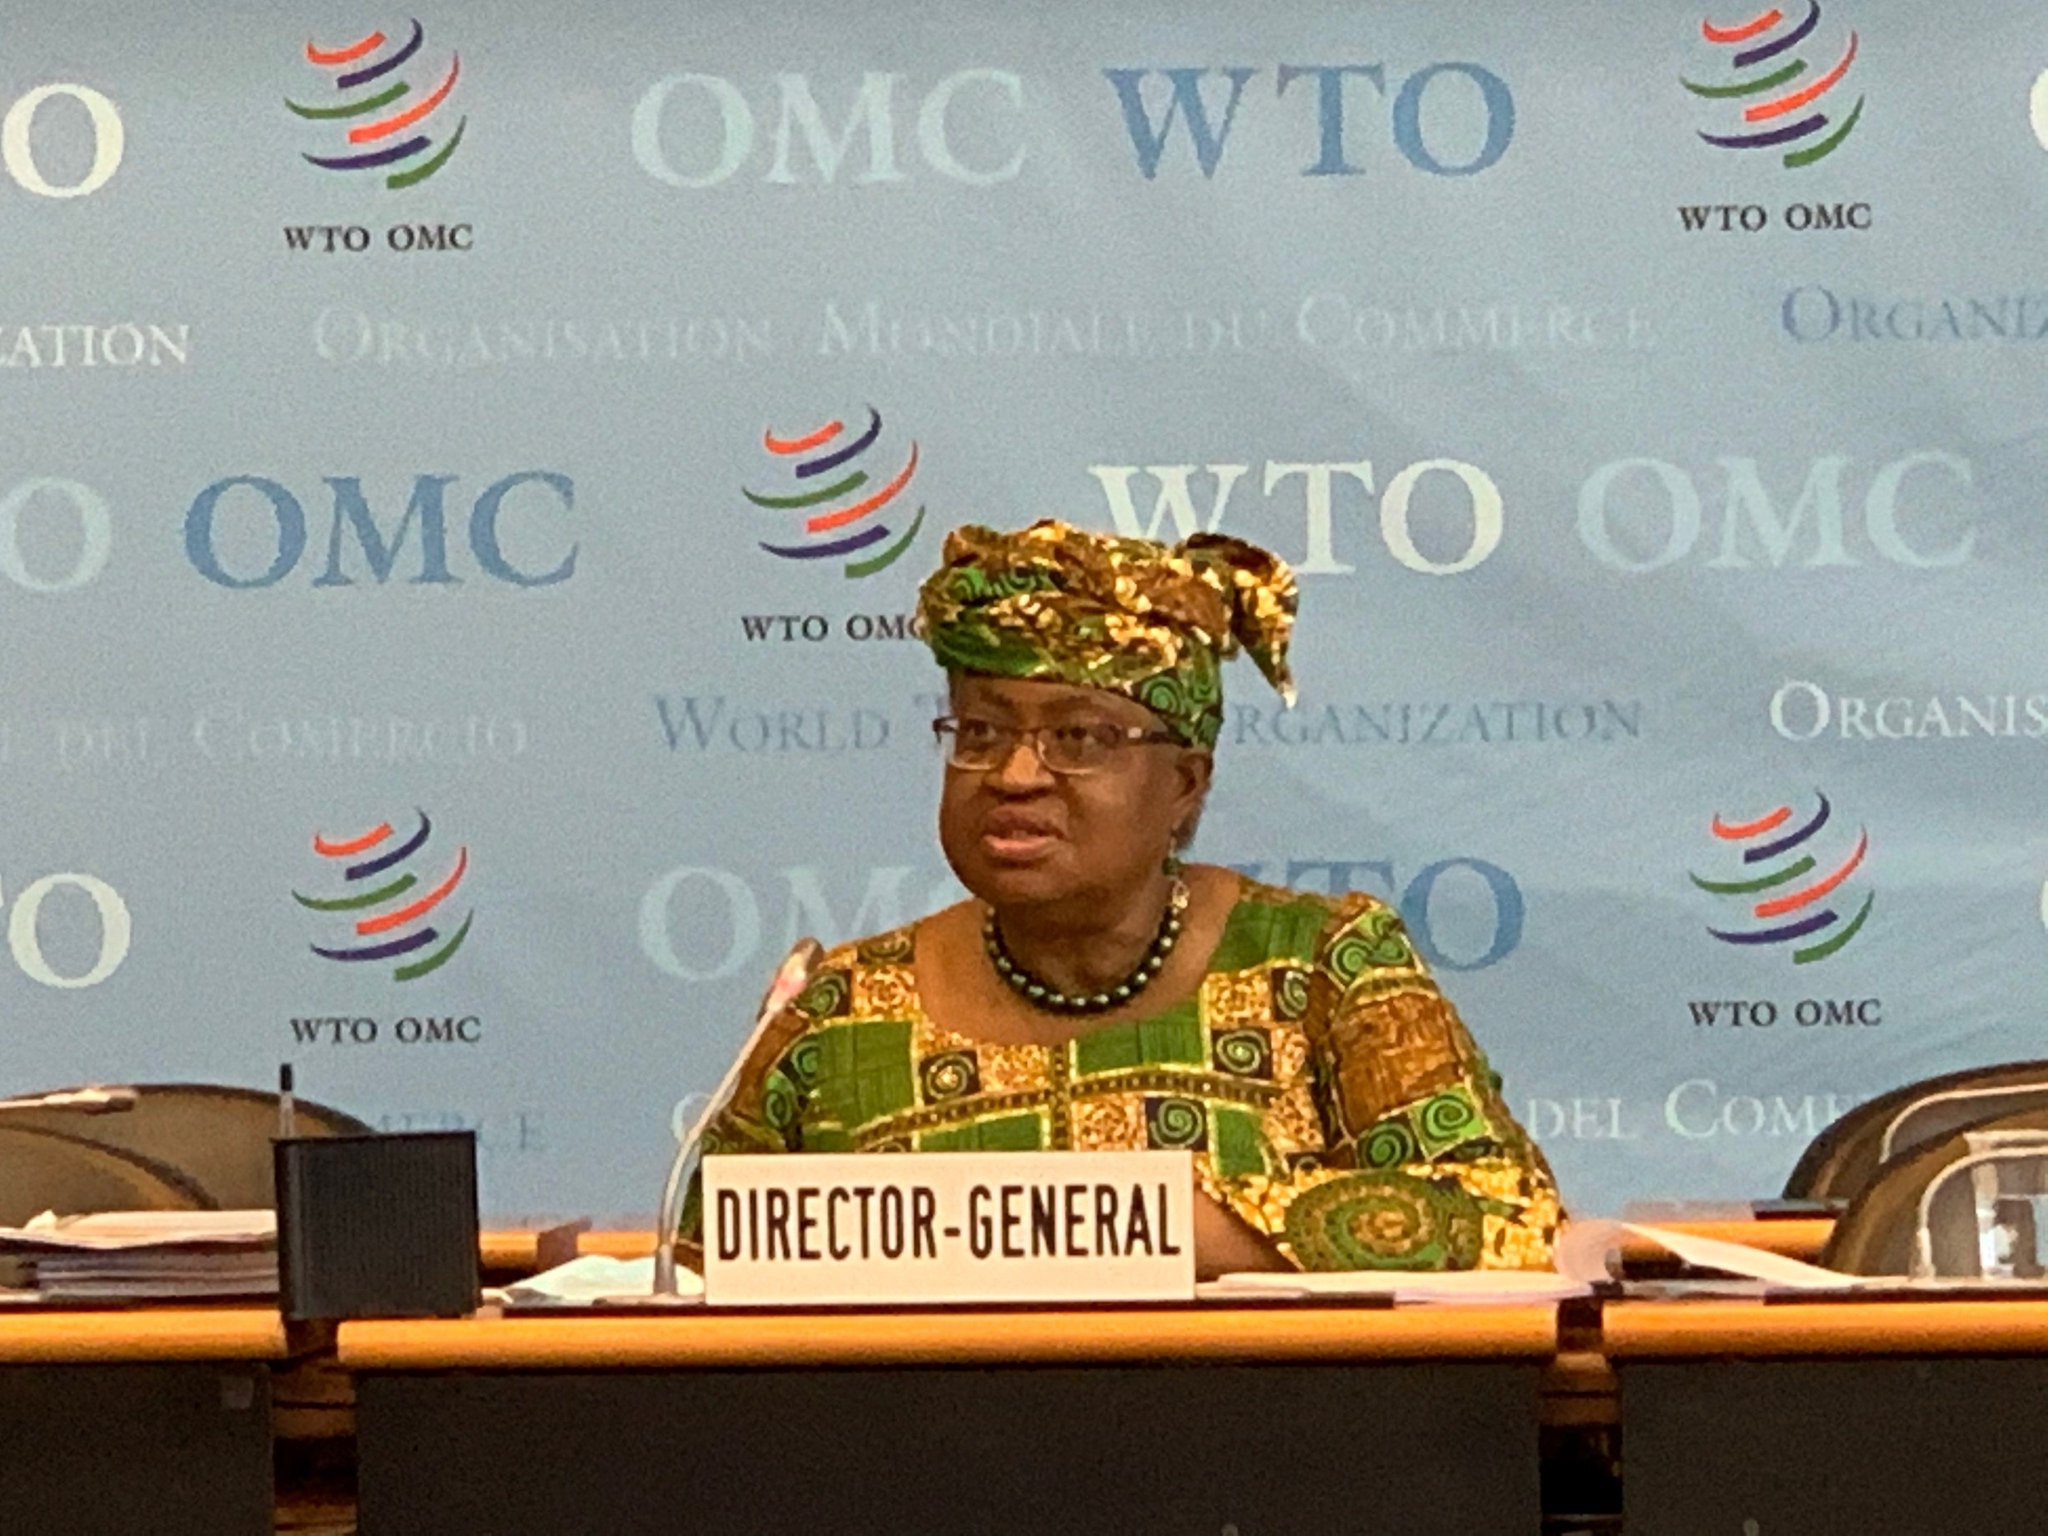 Dr Okonjo-Iweala officially resumed duty as the DG of the WTO